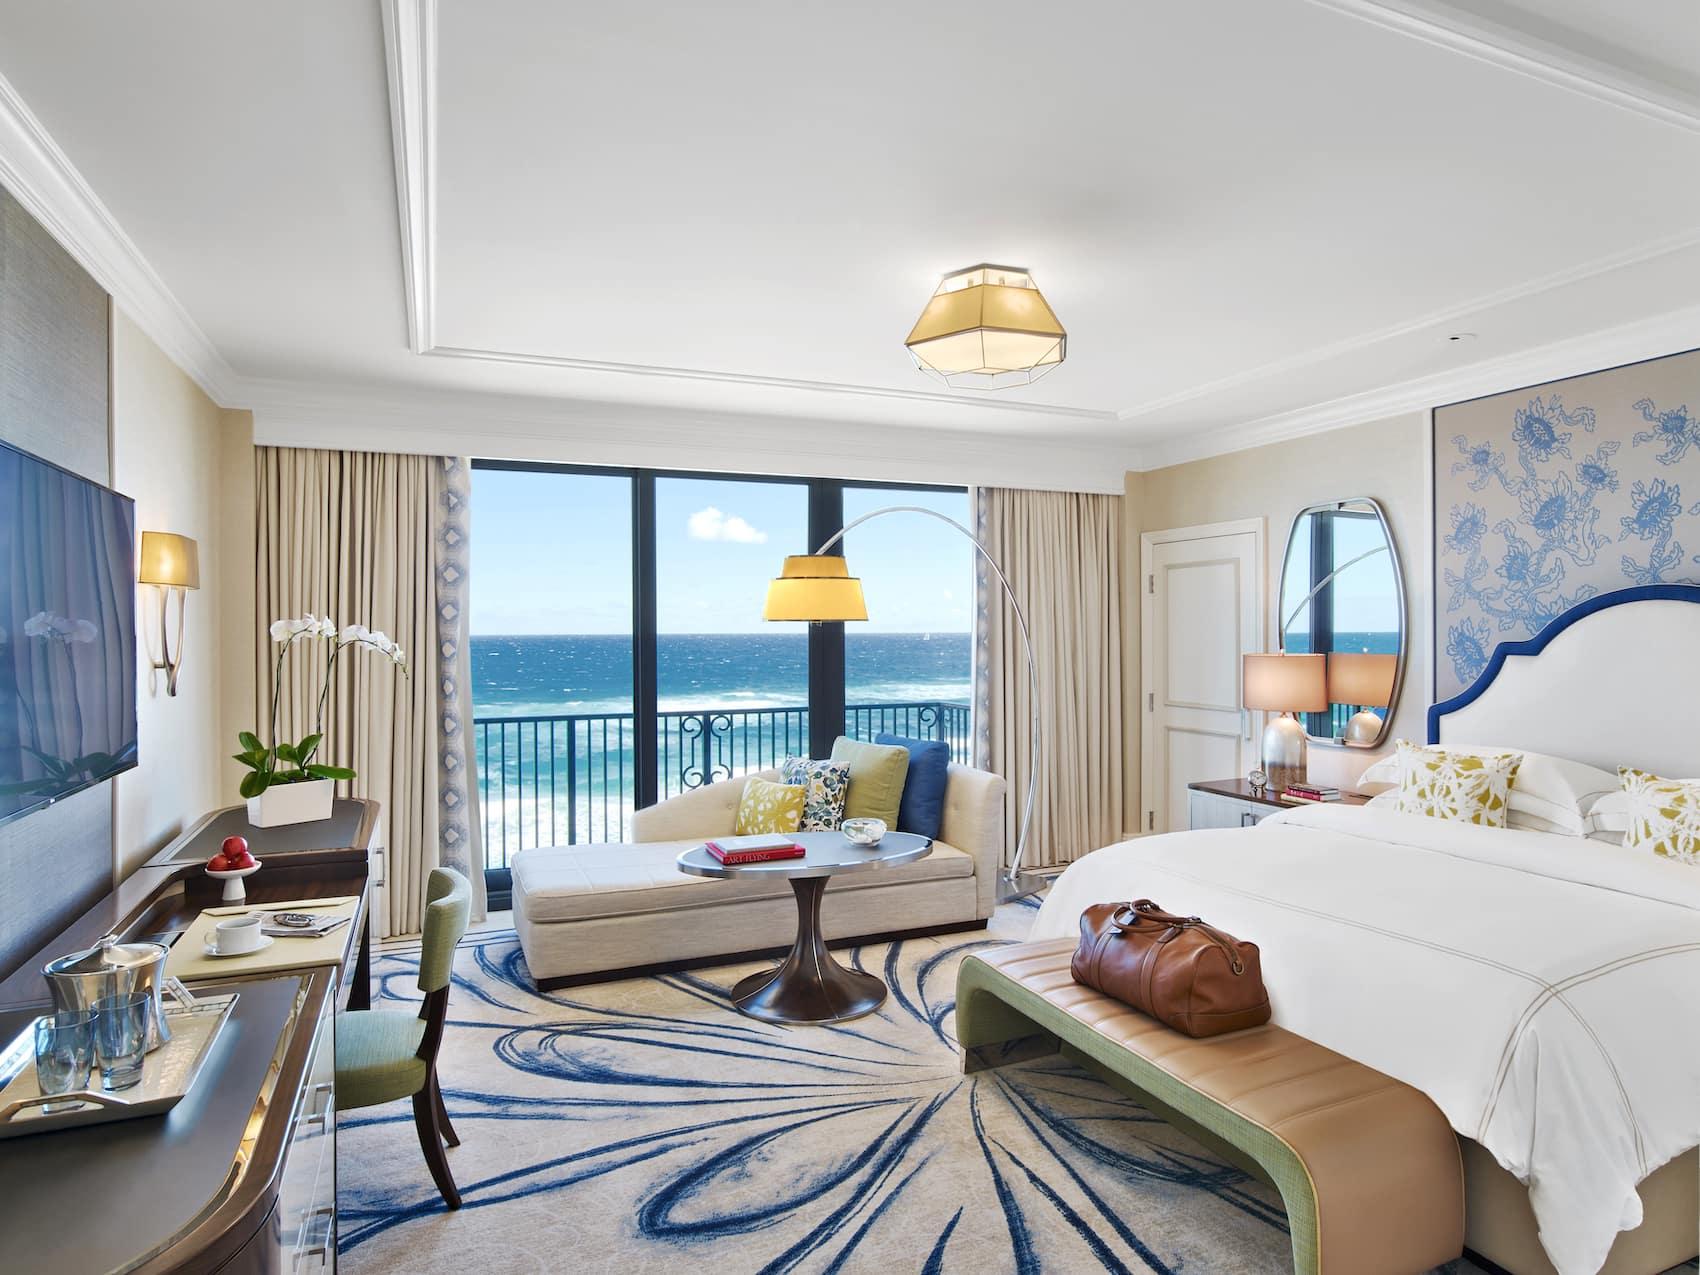 Atlantic King Room Breakers Palm Beach